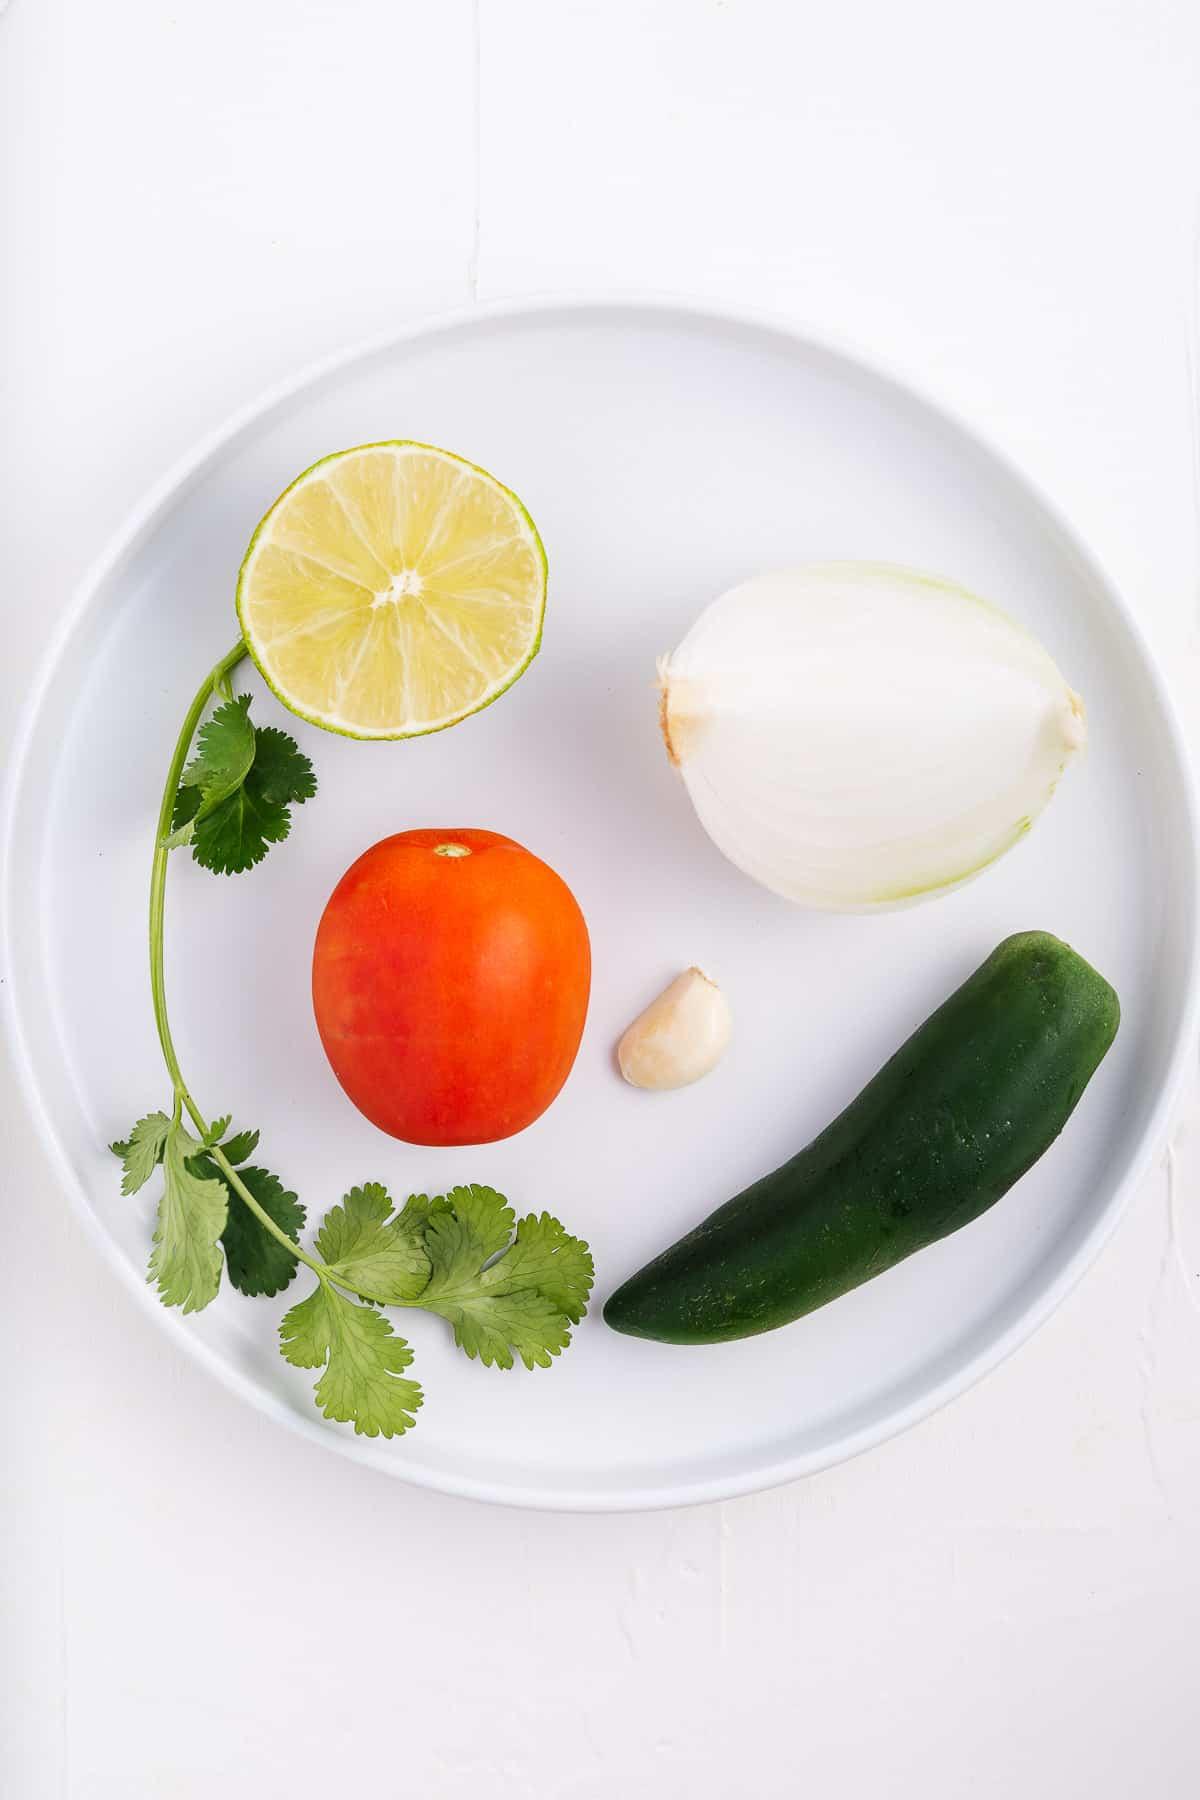 Lime, Cilantro, Onion, Garlic, Tomato, and Jalapeno